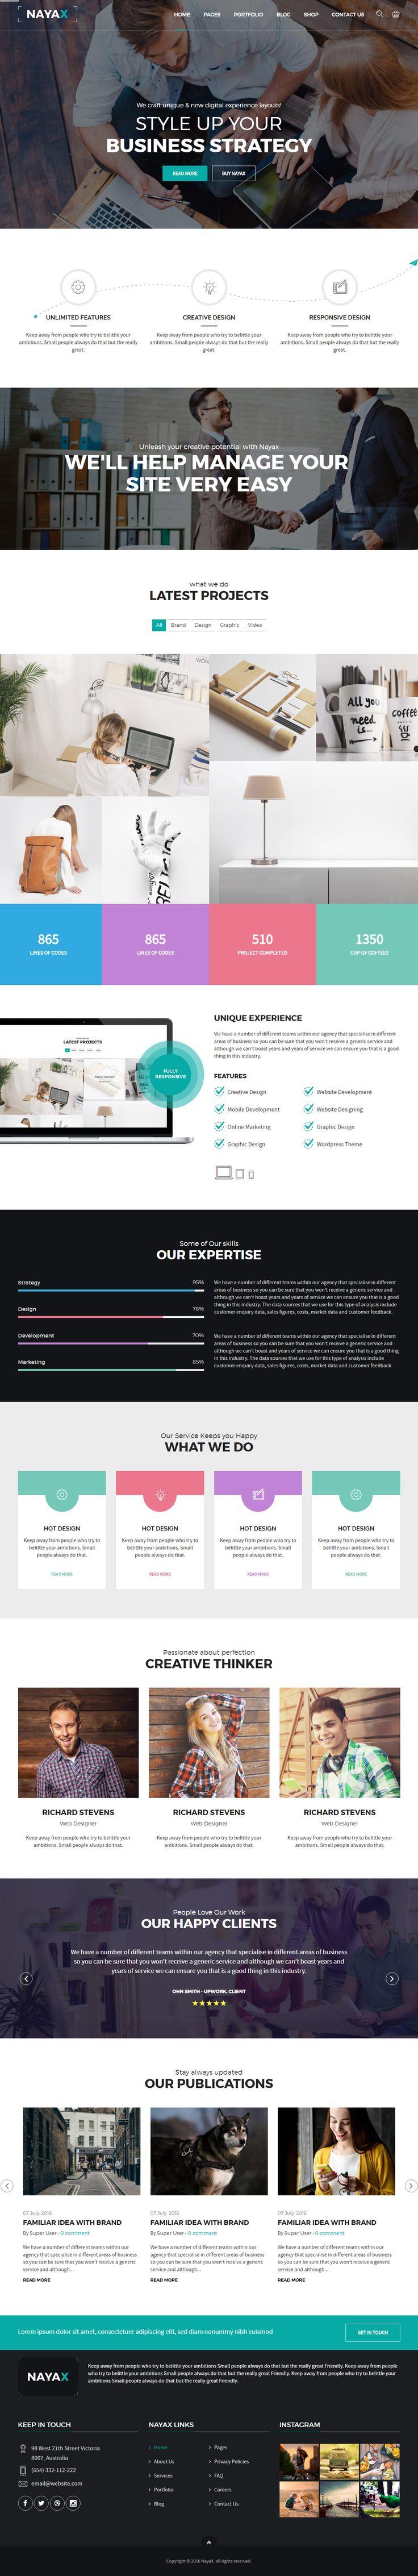 Background image 100 responsive - Nayax Is Premium Responsive Retina Parallax Joomla Template Bootstrap 3 Video Background